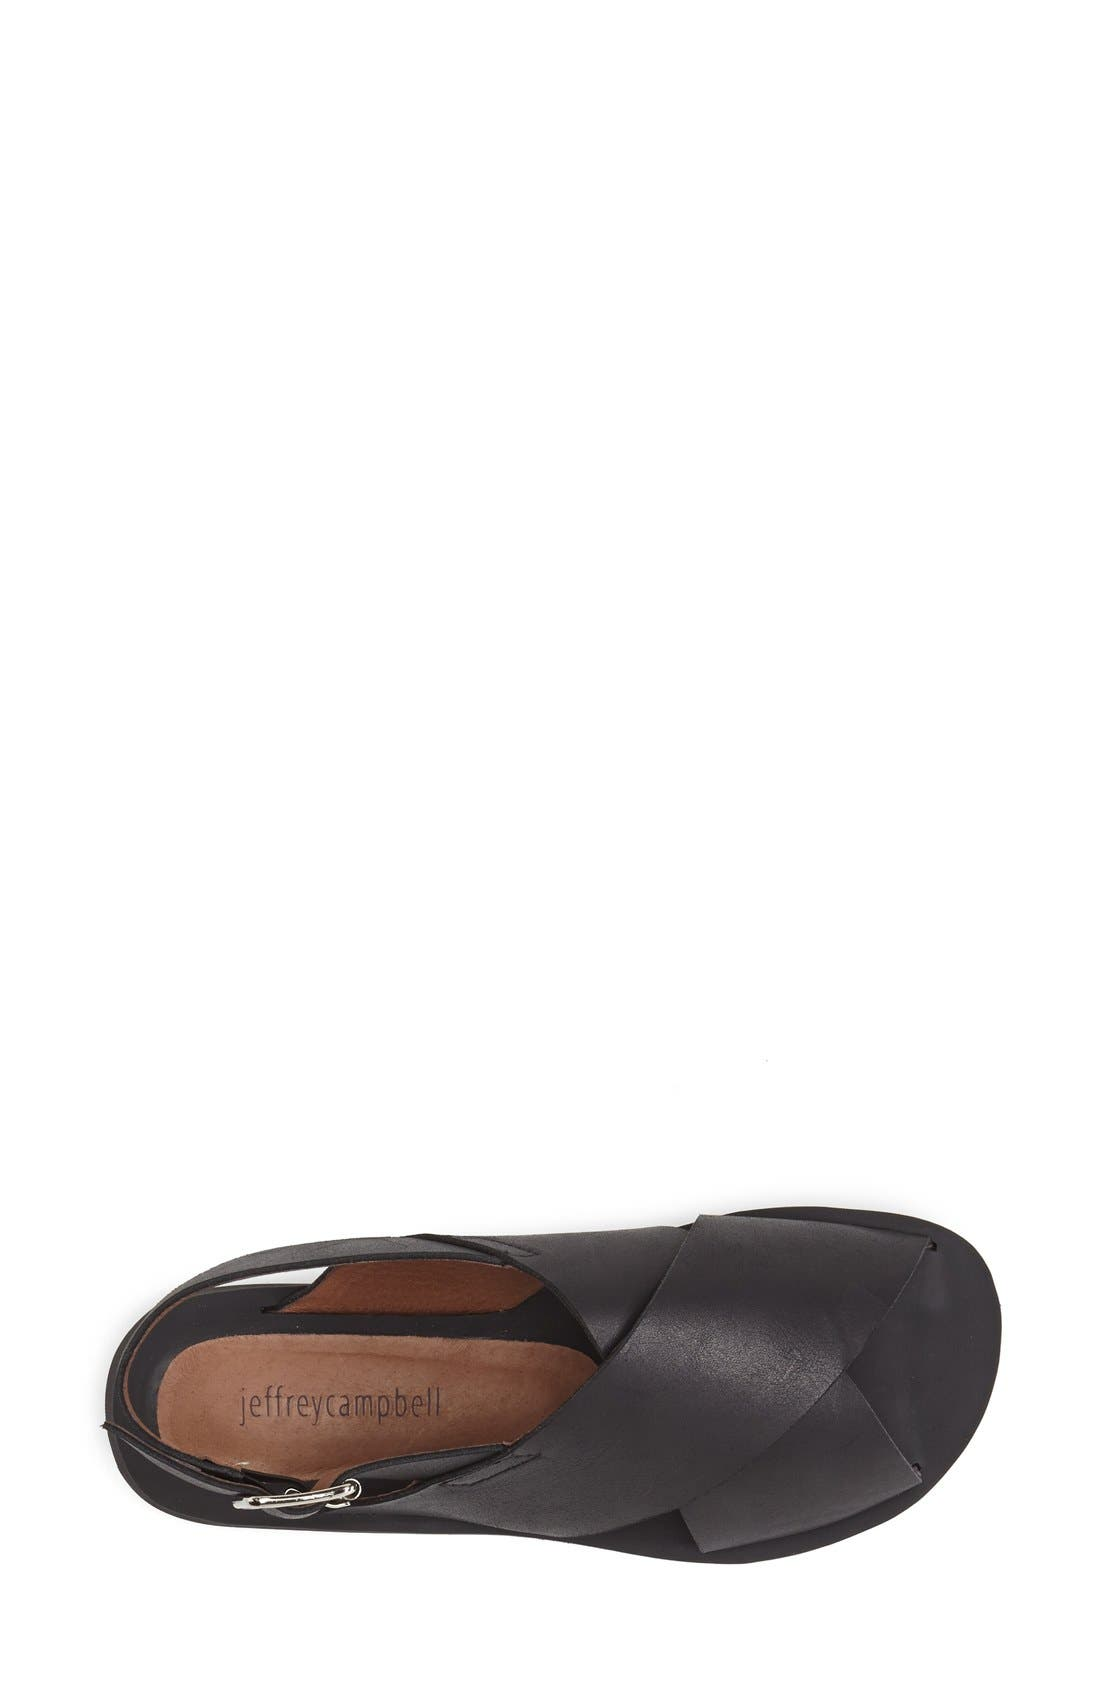 Alternate Image 3  - Jeffrey Campbell 'Maldives' Leather Sandal (Women)